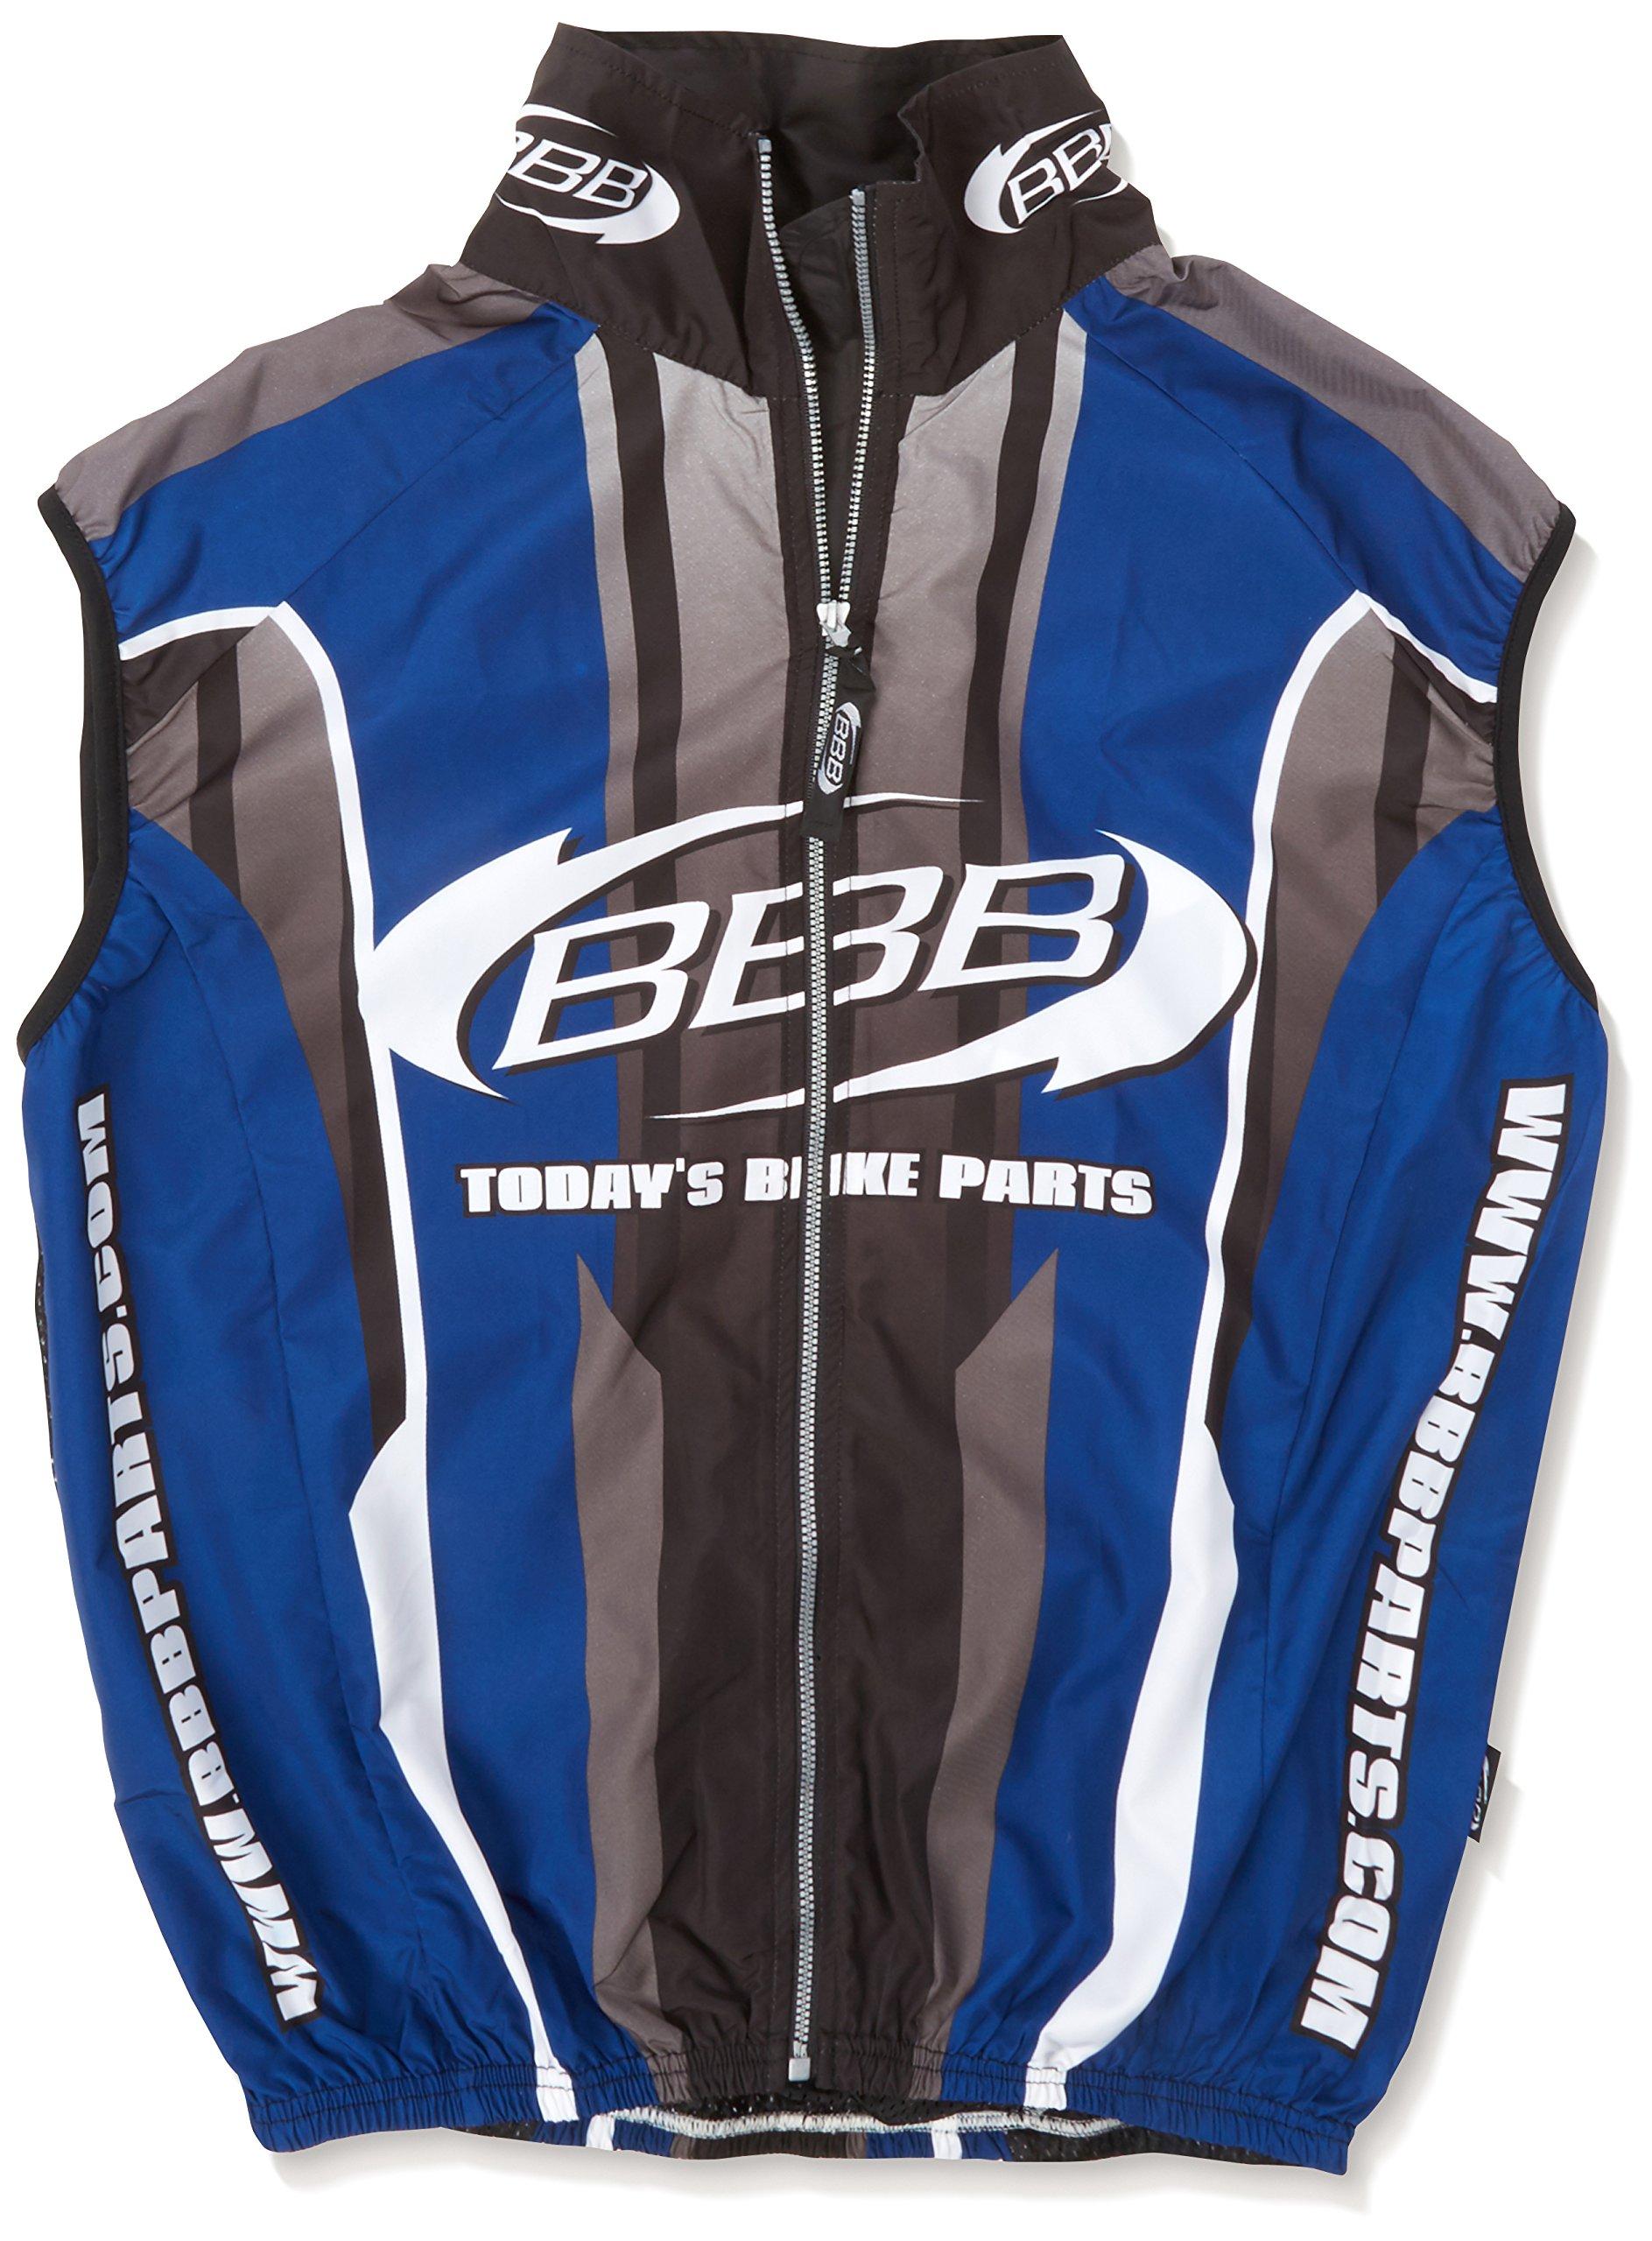 BBB BBW-Veste-Team 65t-s